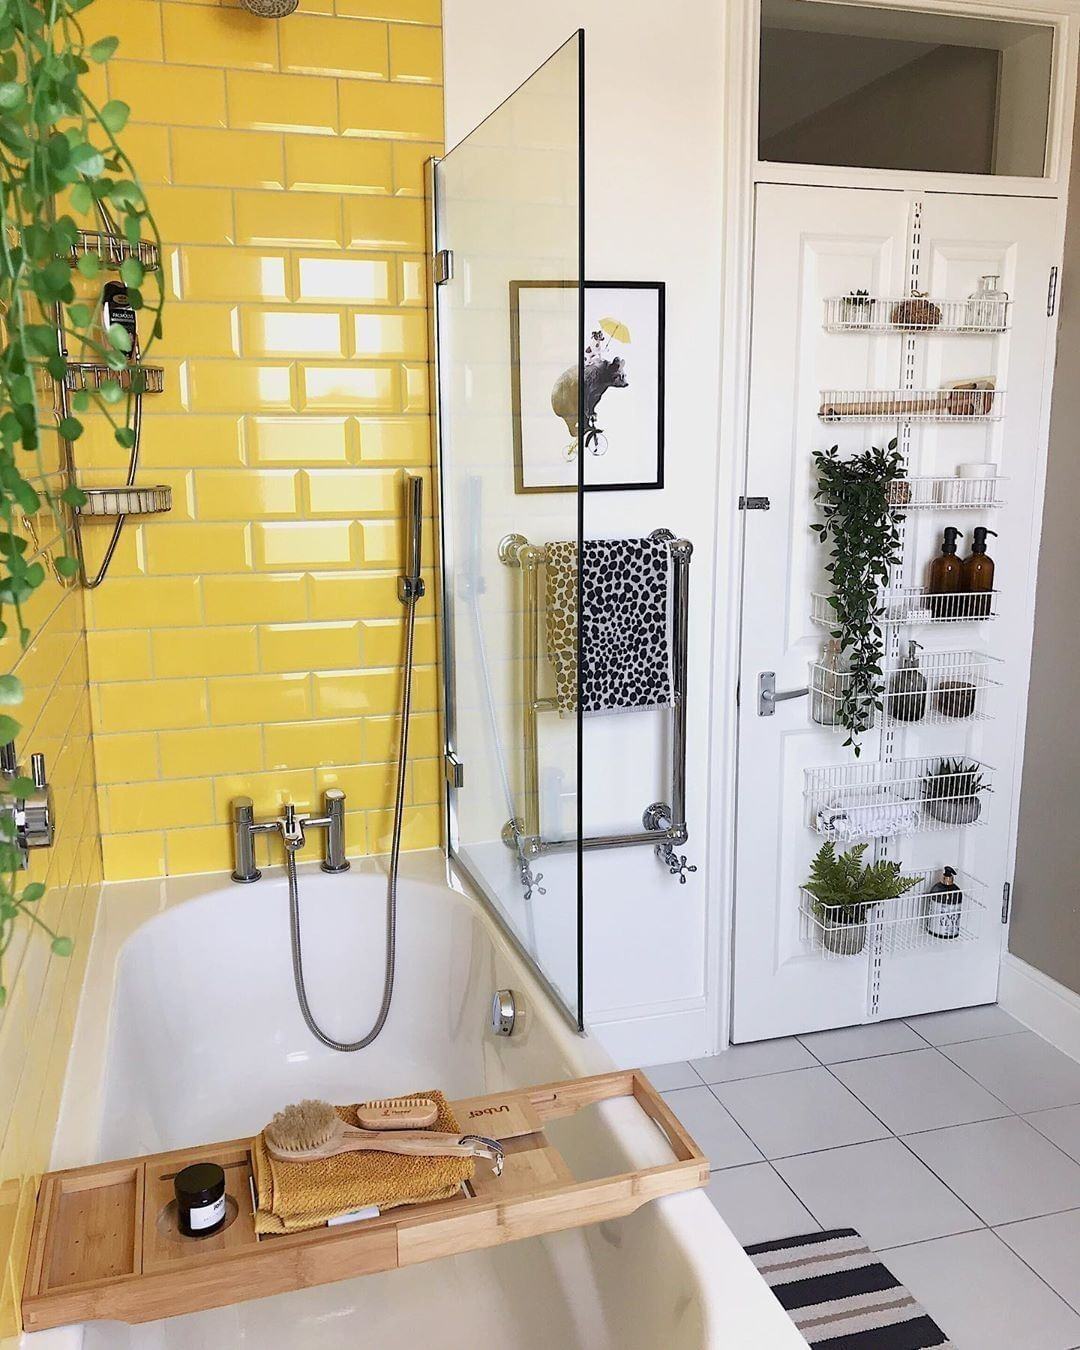 741 Me Gusta 2 Comentarios Bohemian Decor Bohotribex En Instagram I M So In Love With This Bathro Yellow Bathrooms Bathroom Decor Bathroom Colors Download yellow bathroom decorating